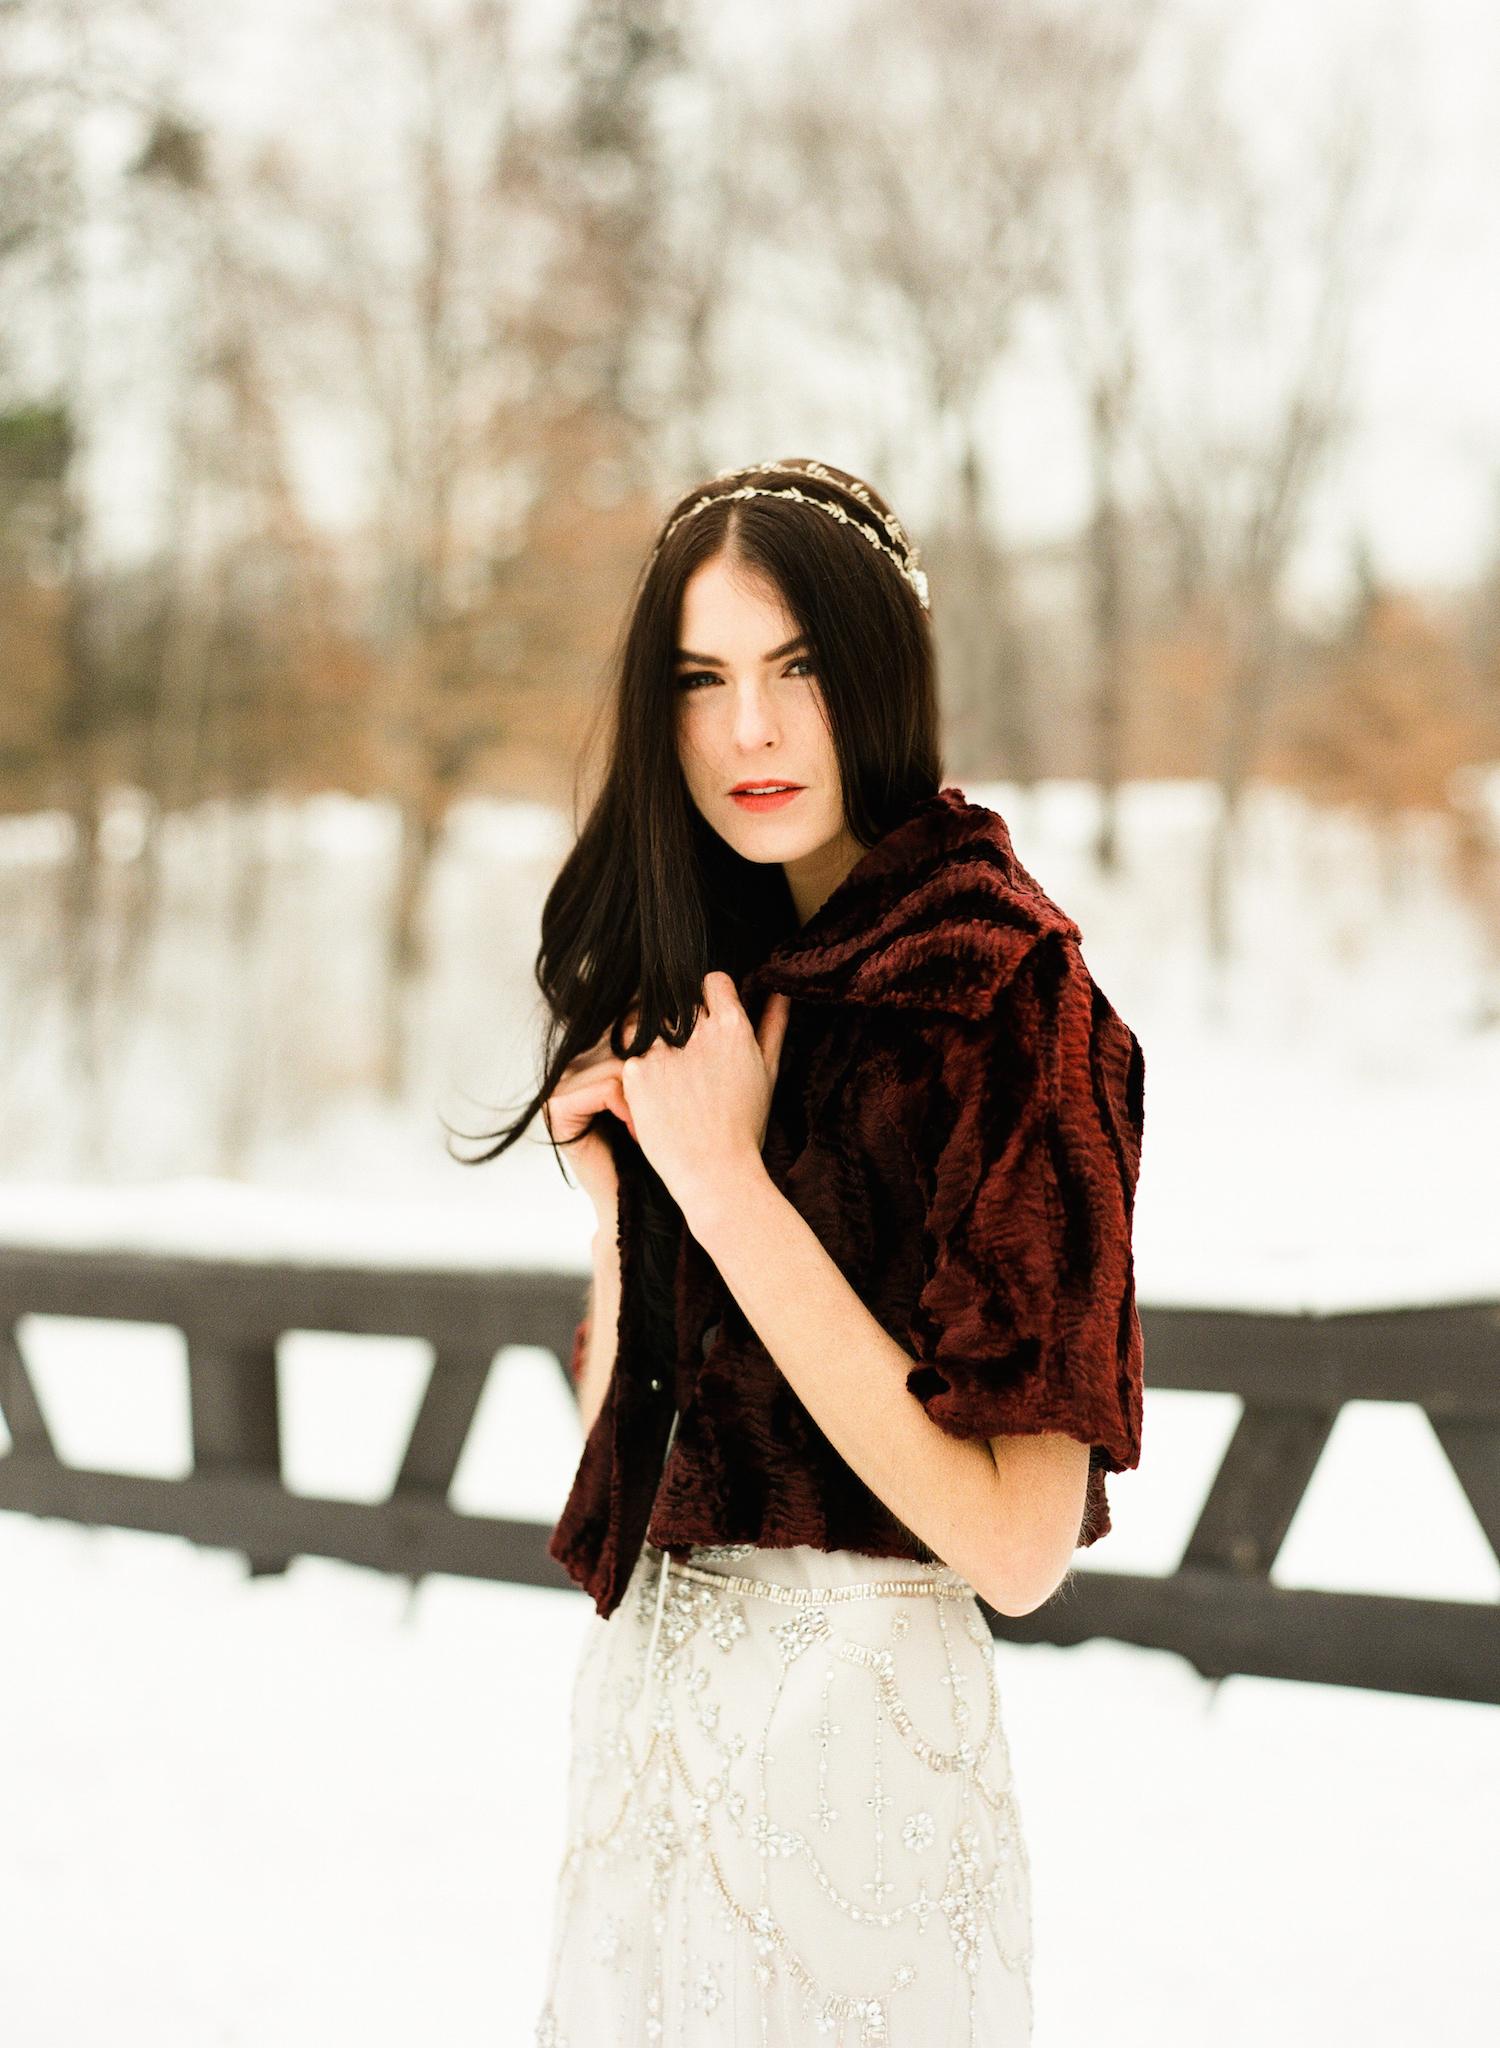 Winter Editorial-JennyPackham-LindsayMaddenPhotography-15 copy.jpg